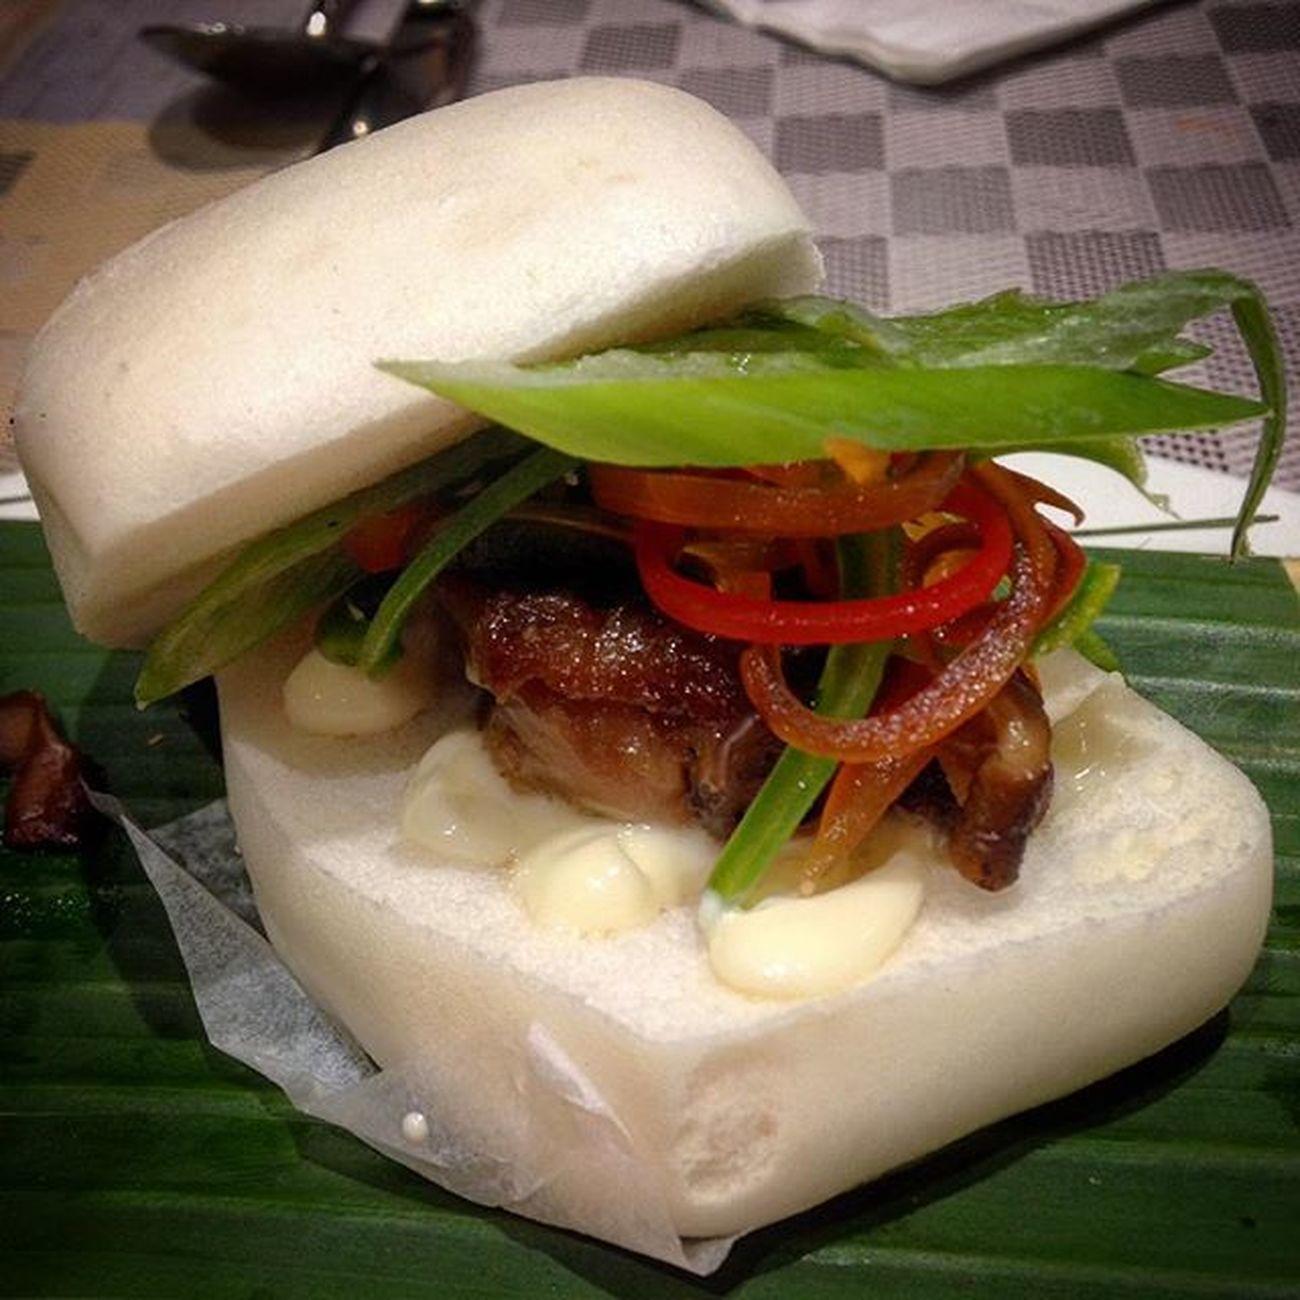 02/27/2016 Newscafe Ramada Snack Snacktime Merienda Meriendatime Cuapao Chinatownbuns Chinatownbun